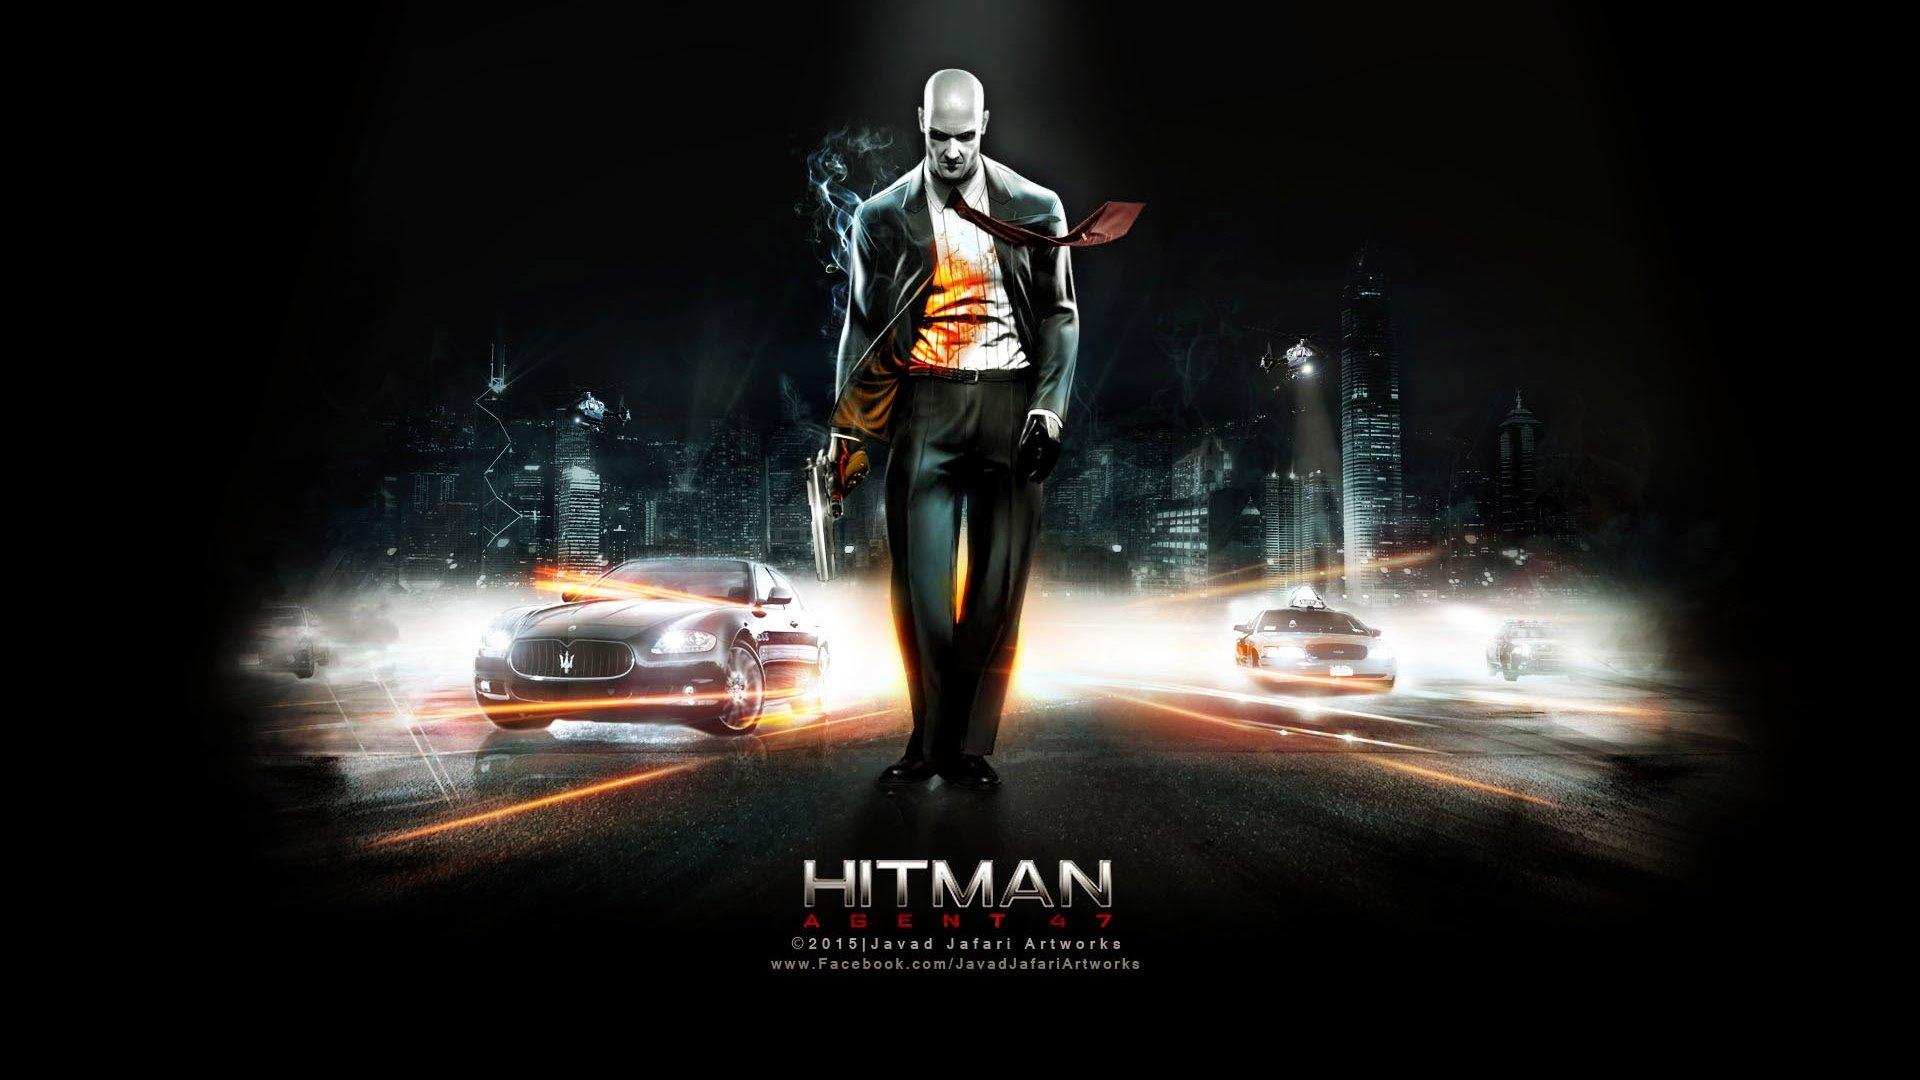 Hitman: Agent 47 Wallpapers · 4K HD Desktop Backgrounds Phone Images